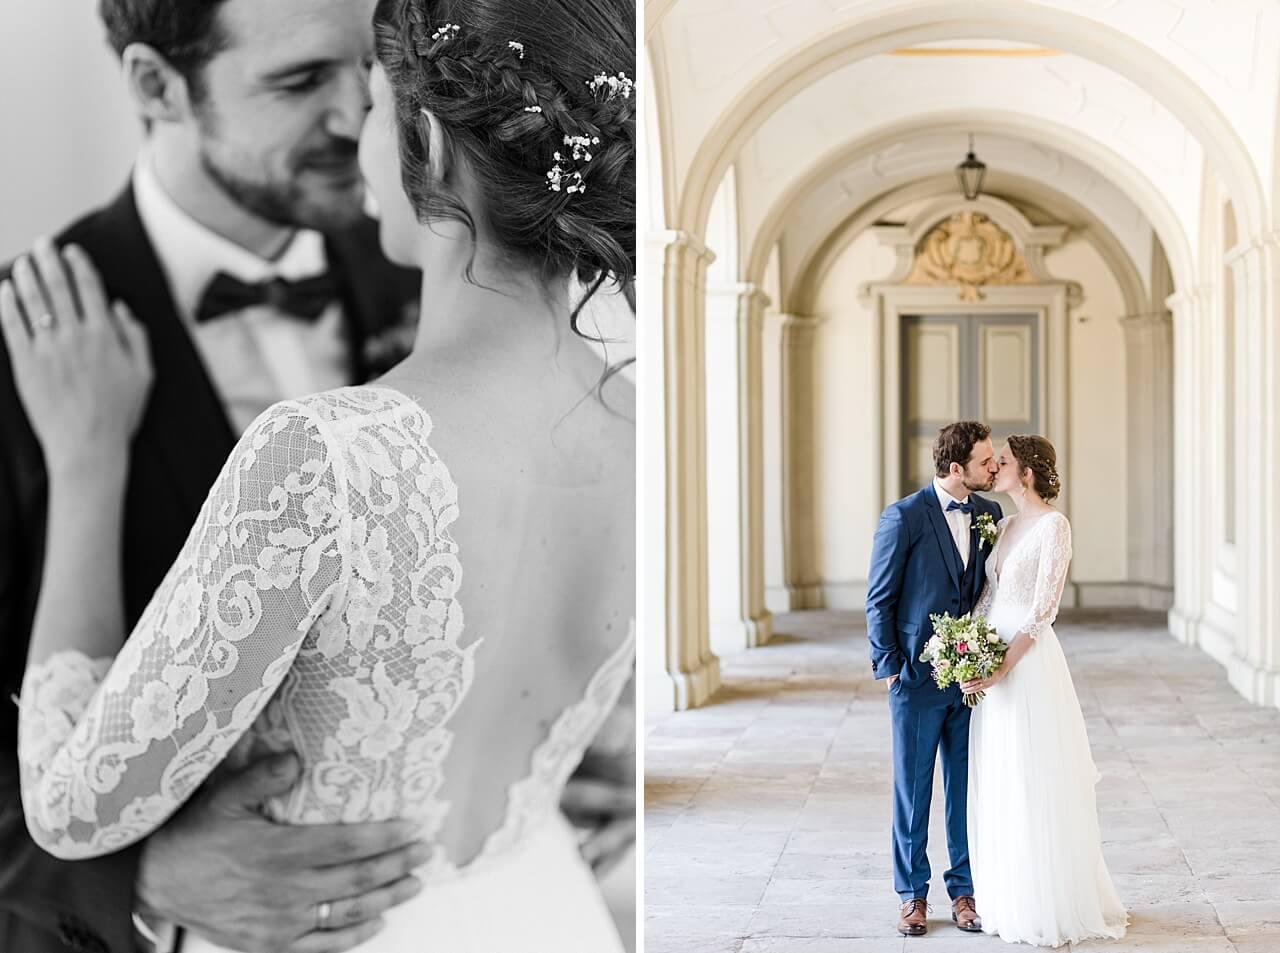 Rebecca Conte Fotografie: Romantische Hochzeitsfotos 12